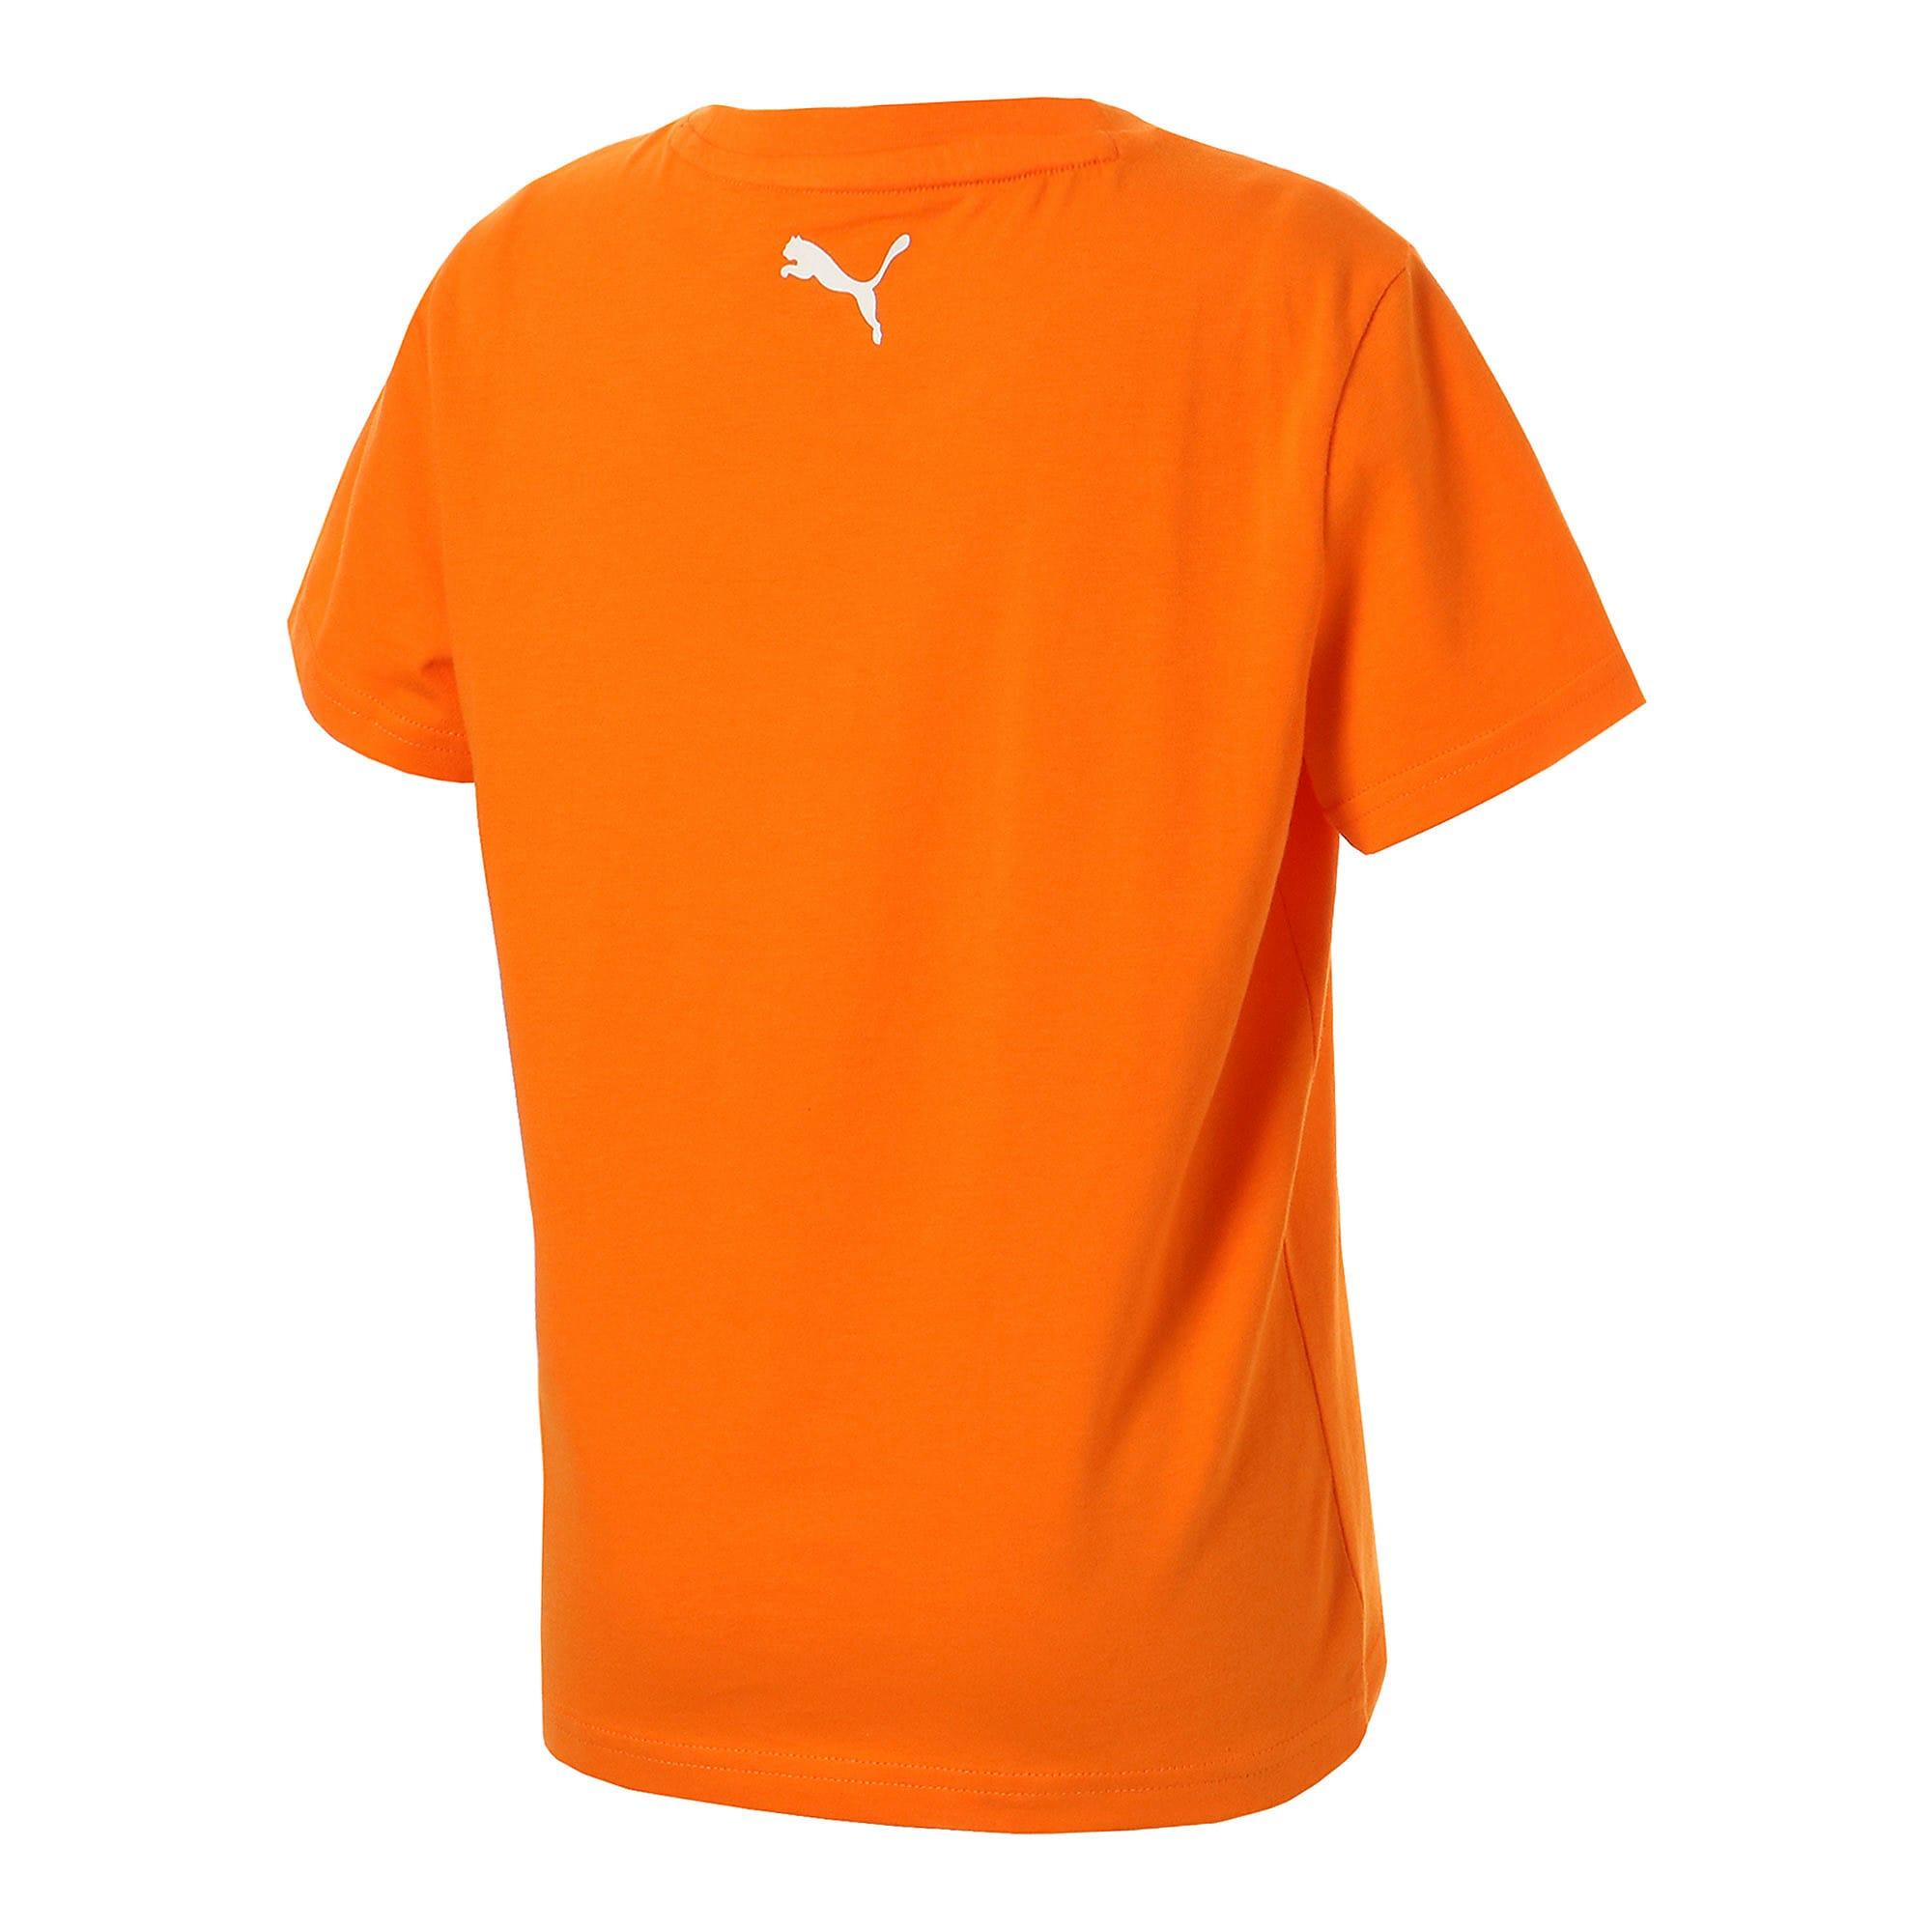 Thumbnail 3 of キッズ ALPHA SS グラフィック Tシャツ 半袖, Orange Popsicle, medium-JPN